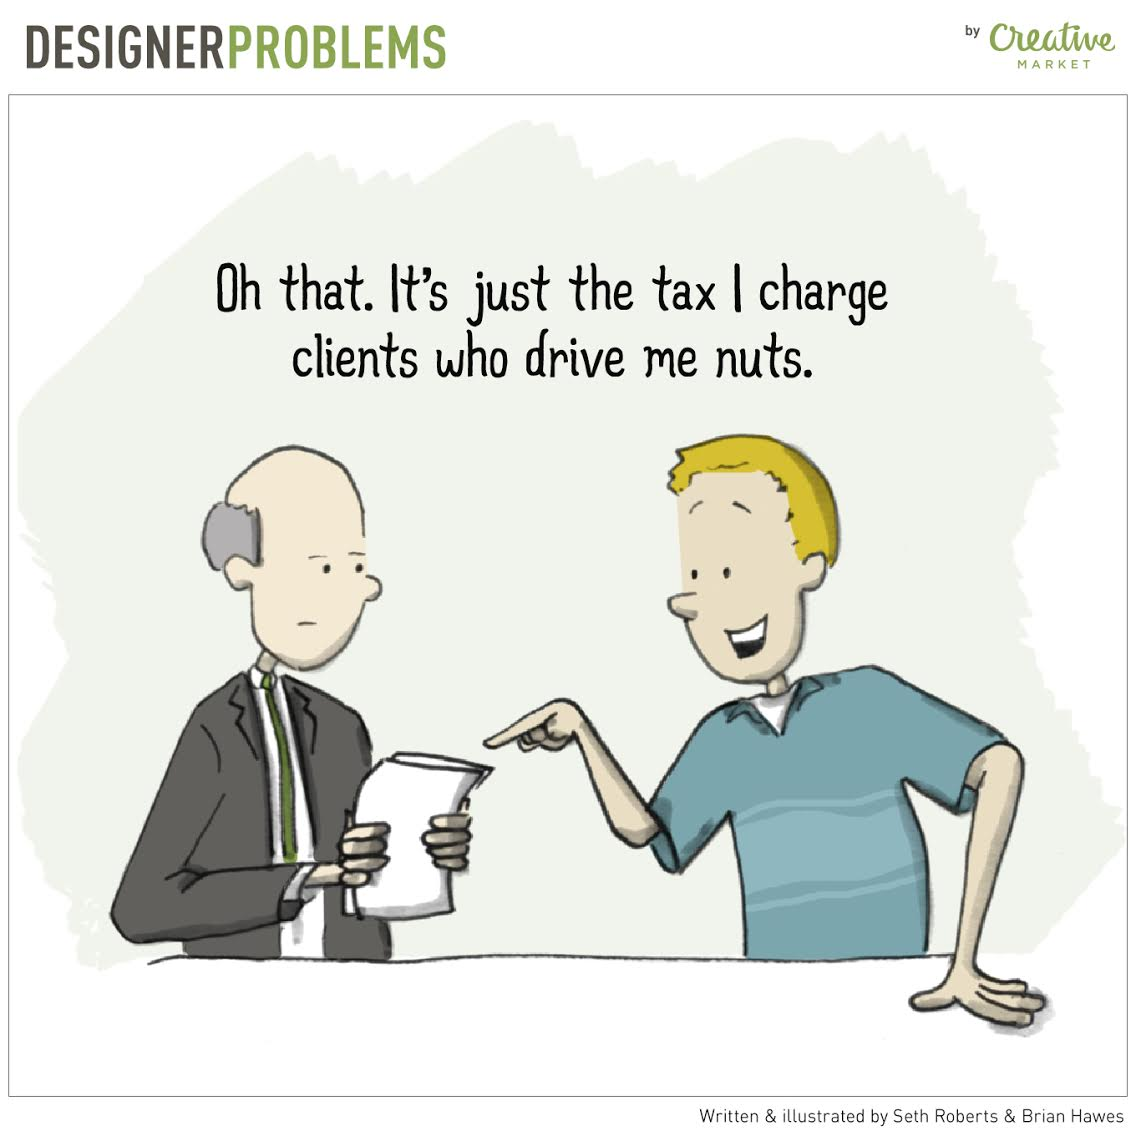 designerproblems22